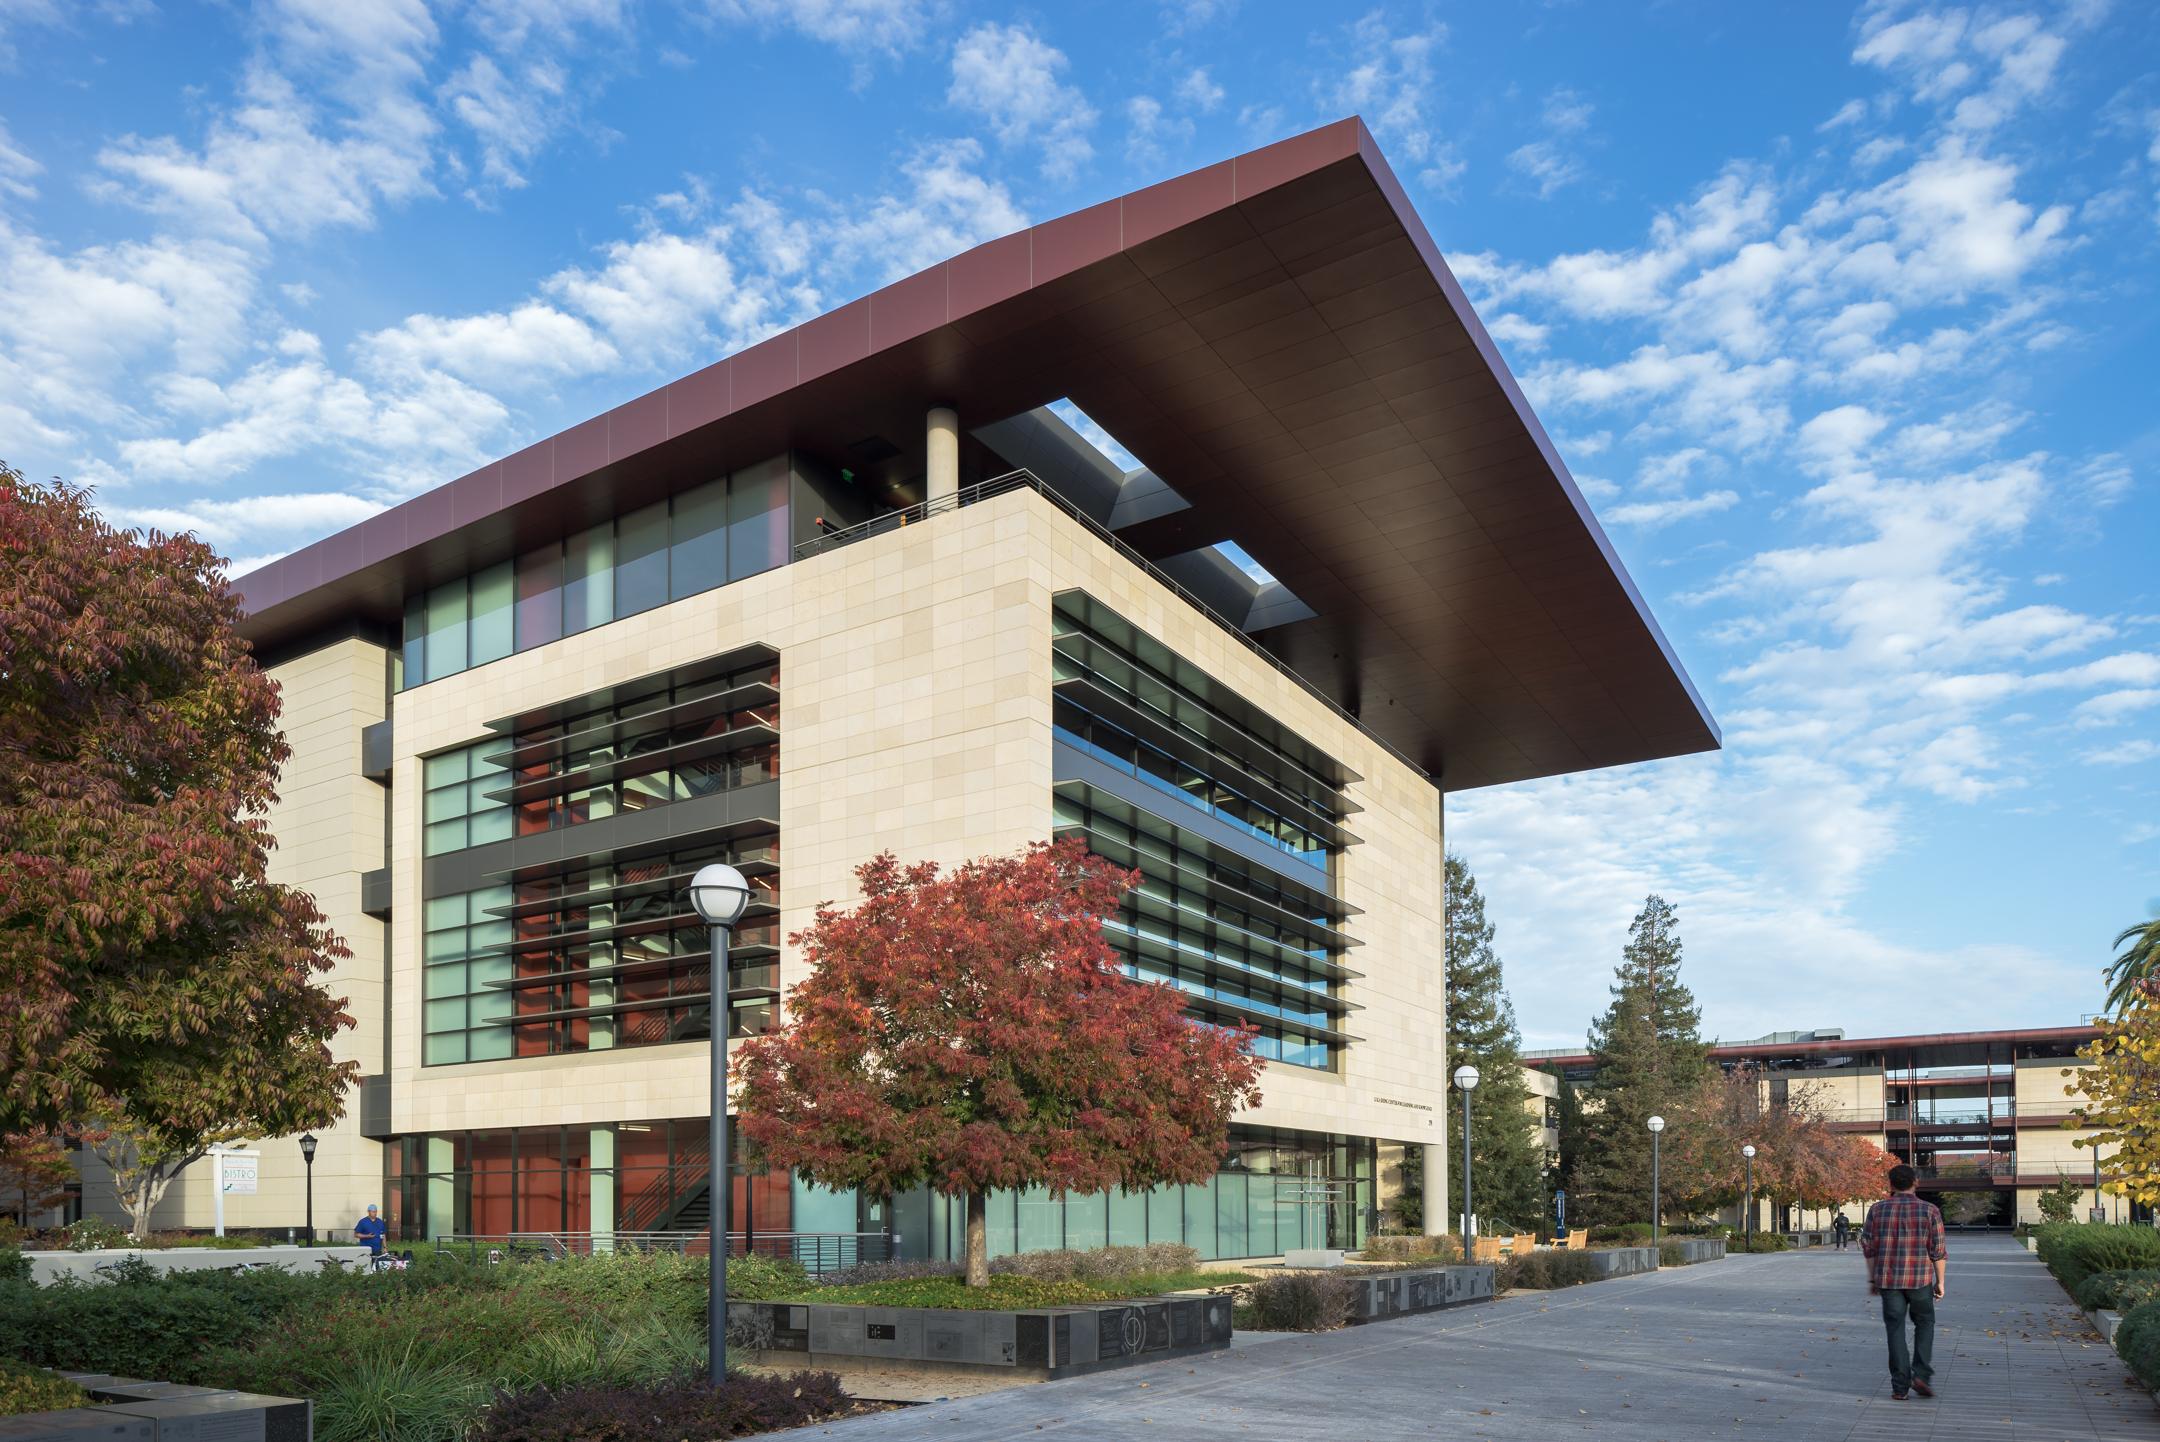 Li Ka Shing Center Stanford University